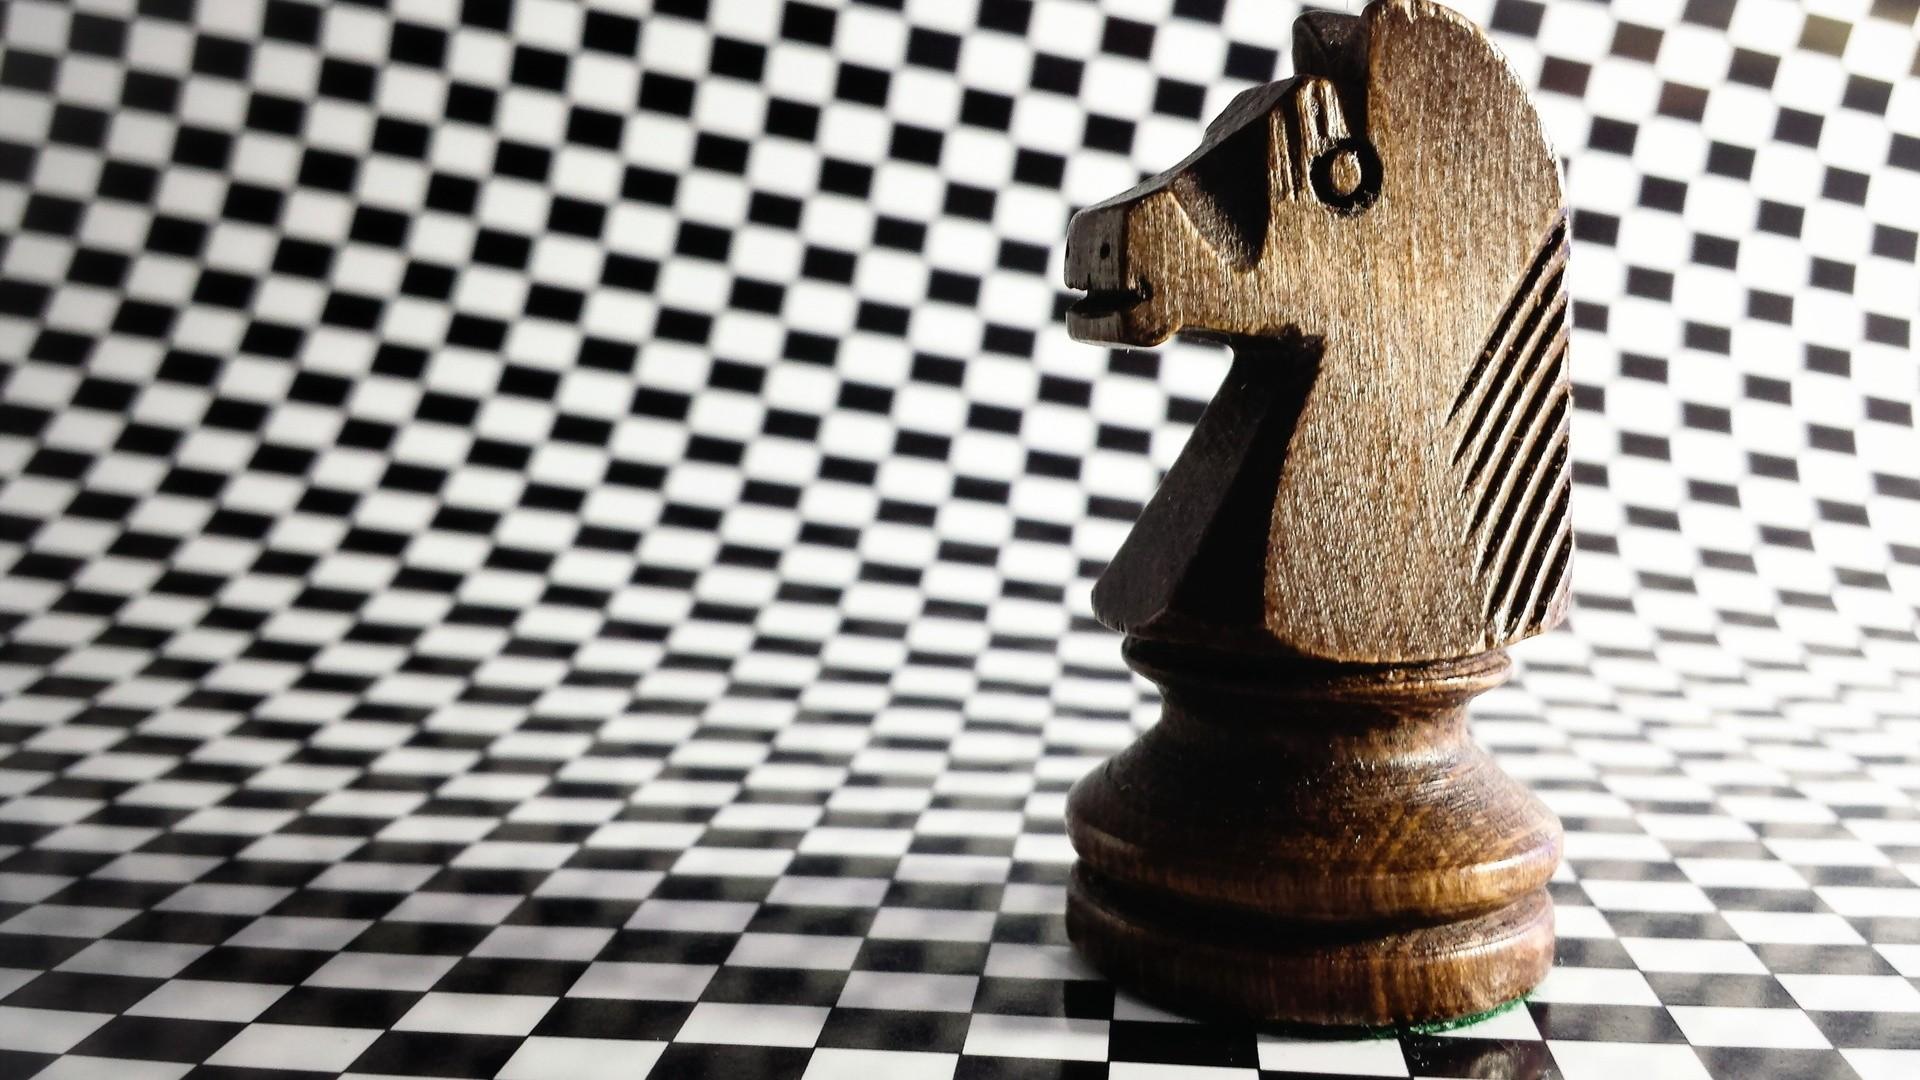 Chess Full HD Wallpaper